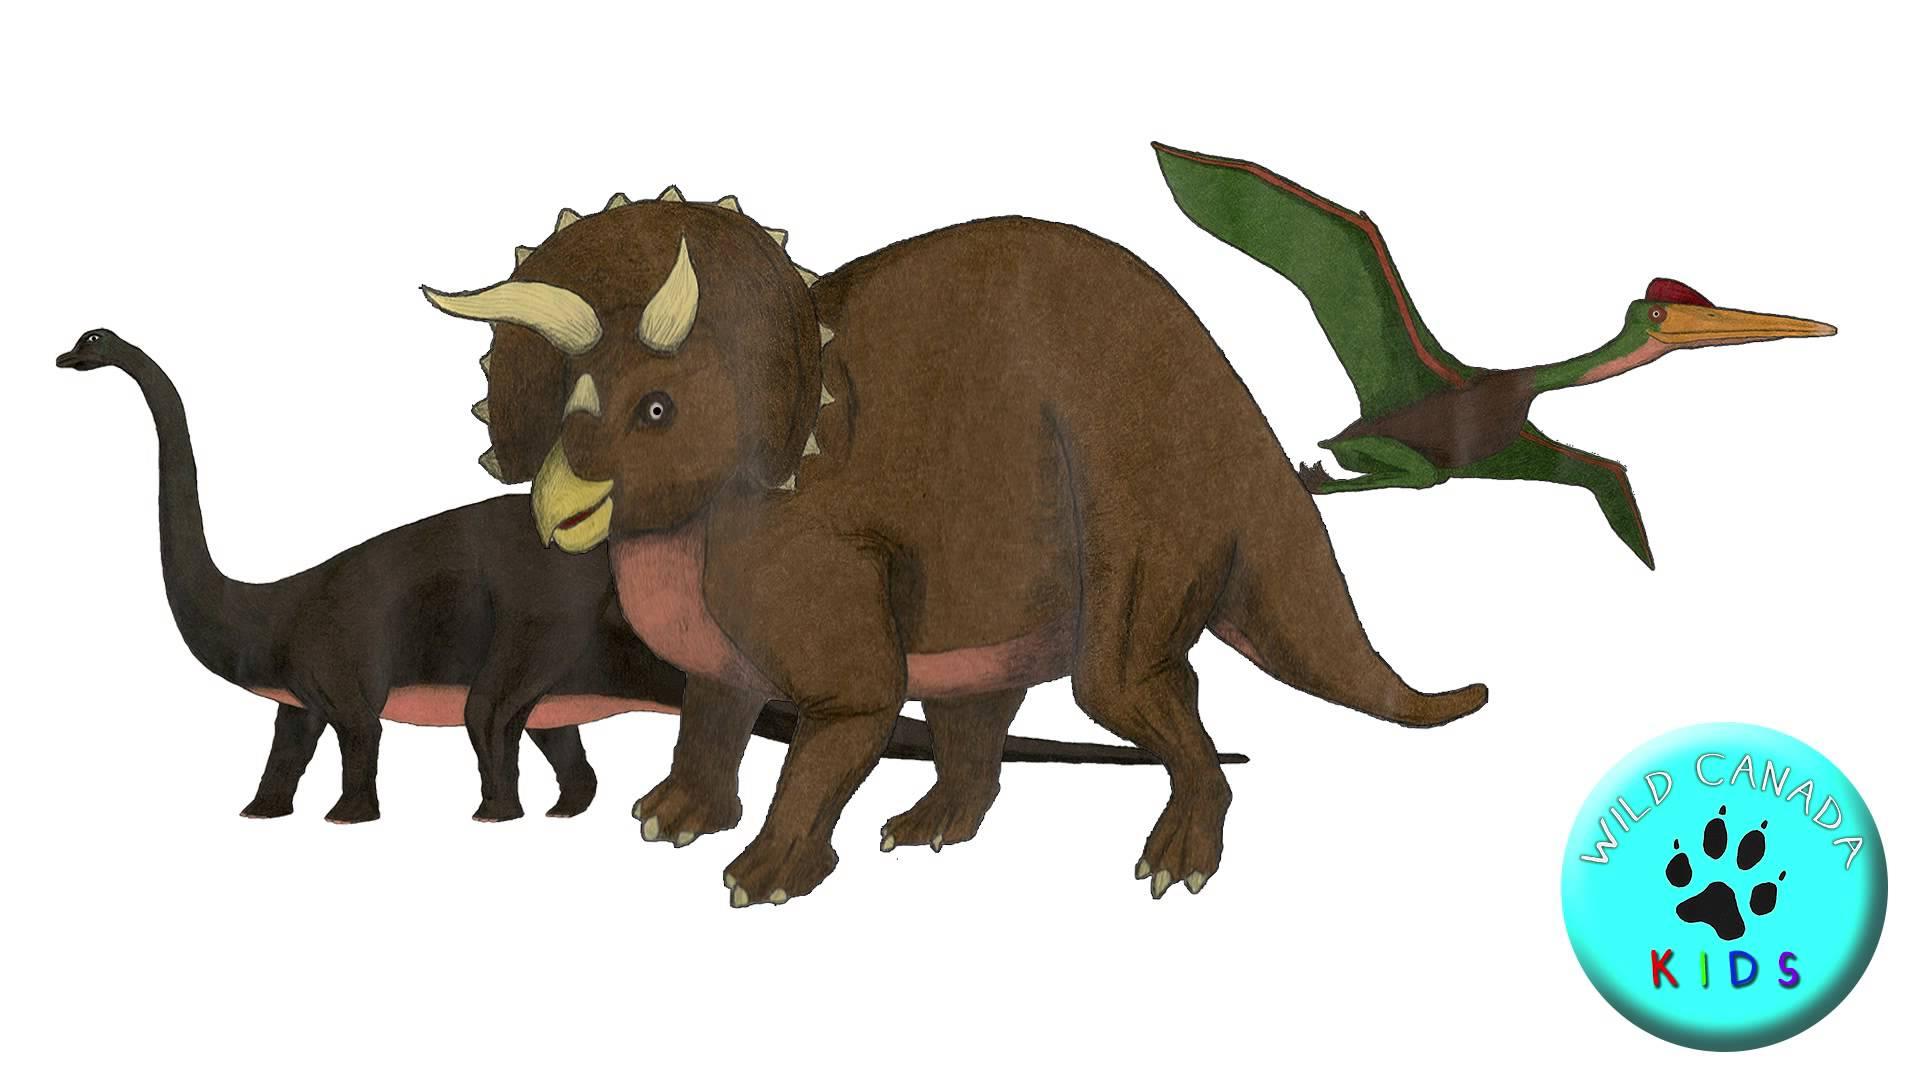 Dinosaur Wallpaper Cute Free Dinosaurs Cartoon Download Free Clip Art Free Clip